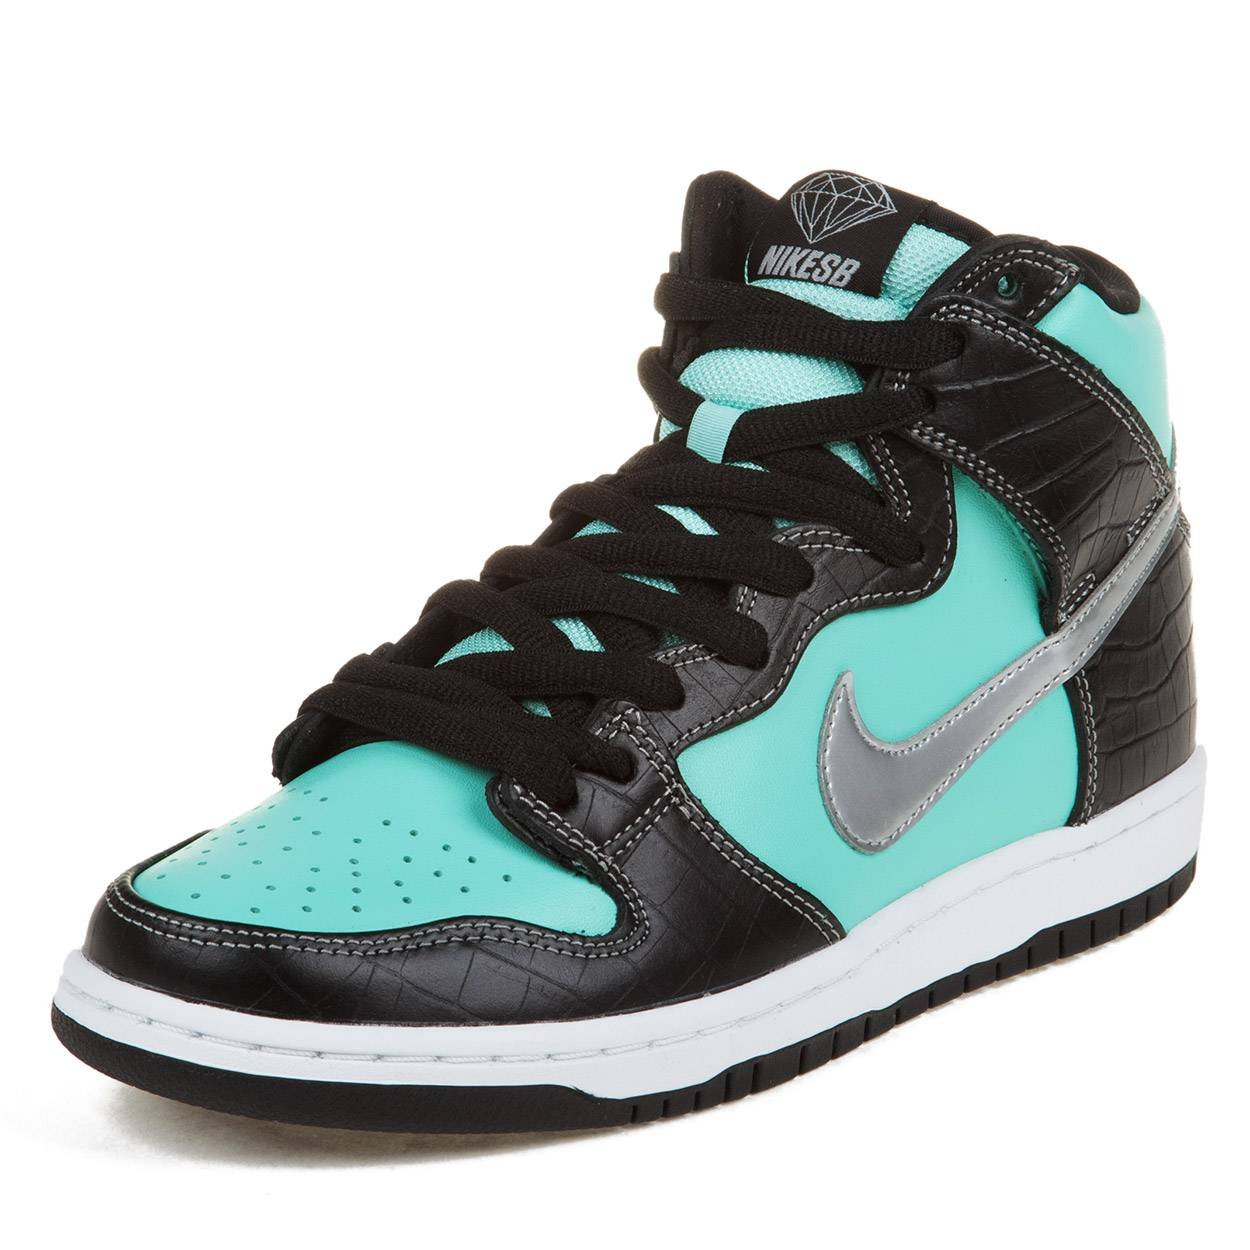 Nike Mens Dunk High PRM SB ''Diamond Supply'' Sz 10.5